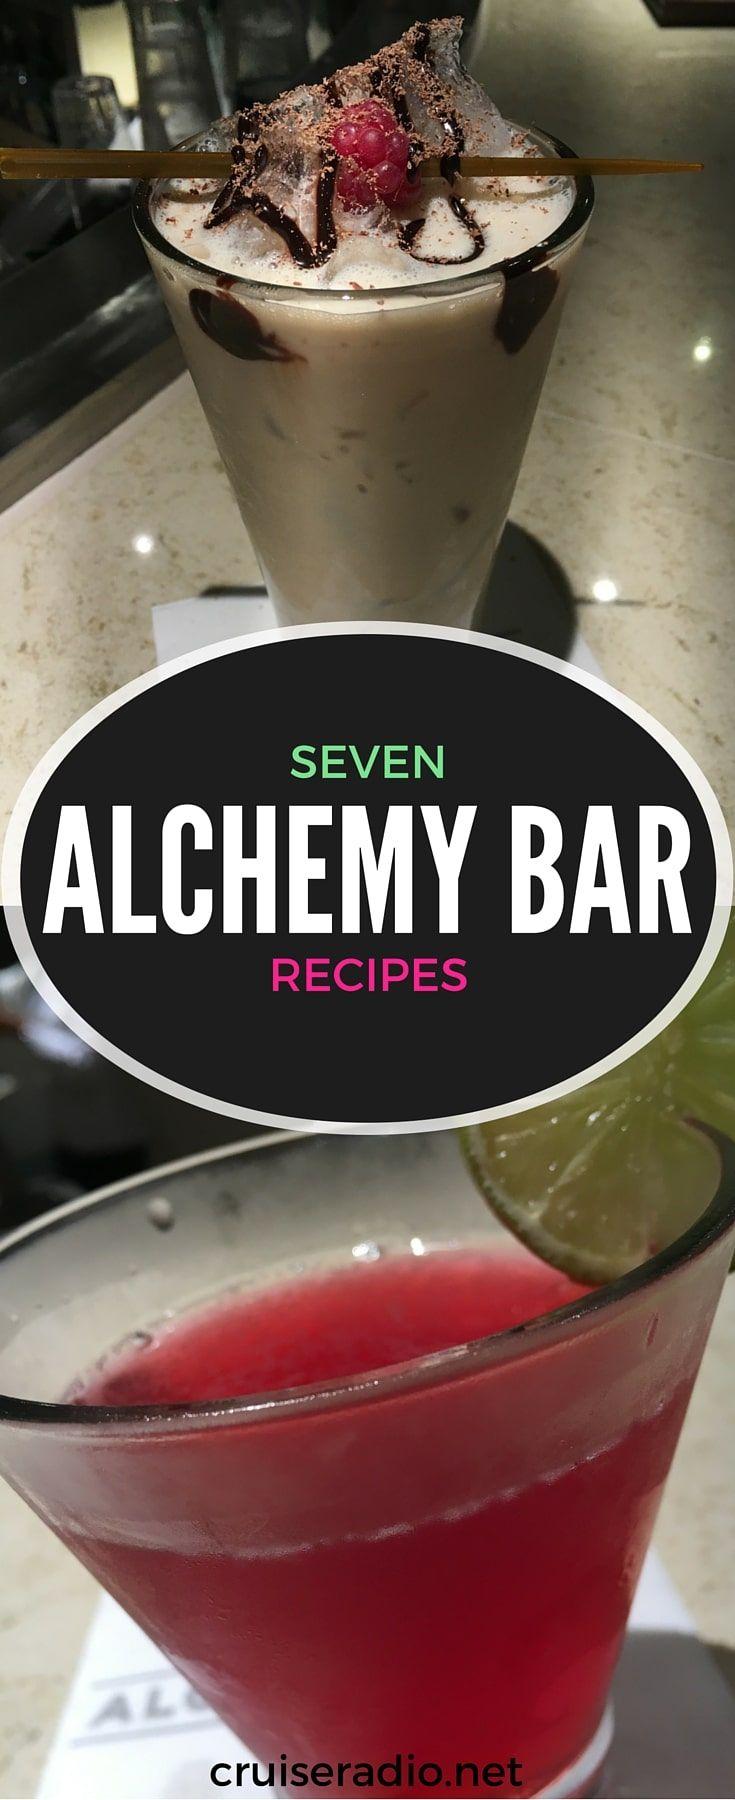 7 Alchemy Bar Recipes To Mix Up At Home Bars Recipes Recipes Bar Drink Recipes